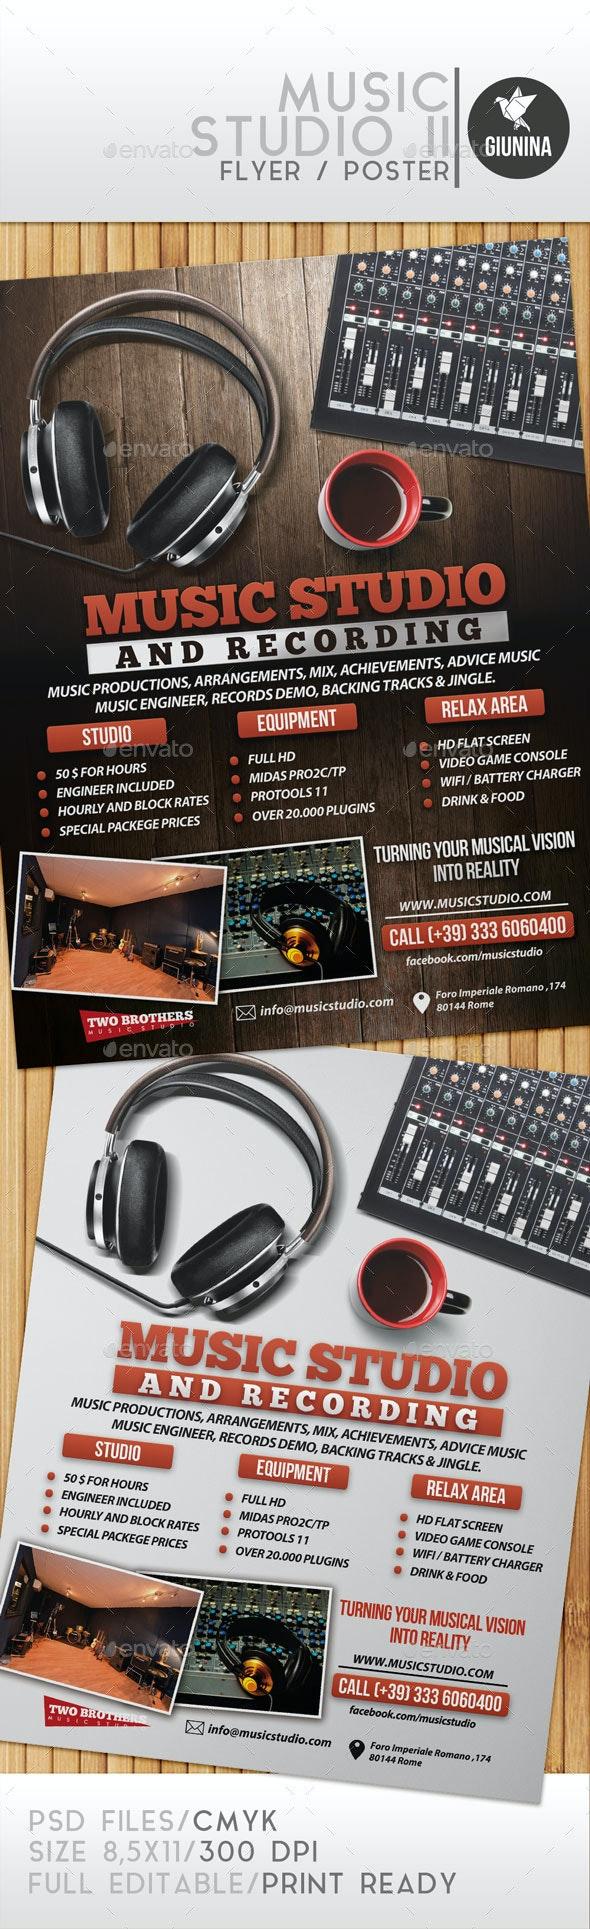 Music Studio II Flyer/Poster - Commerce Flyers